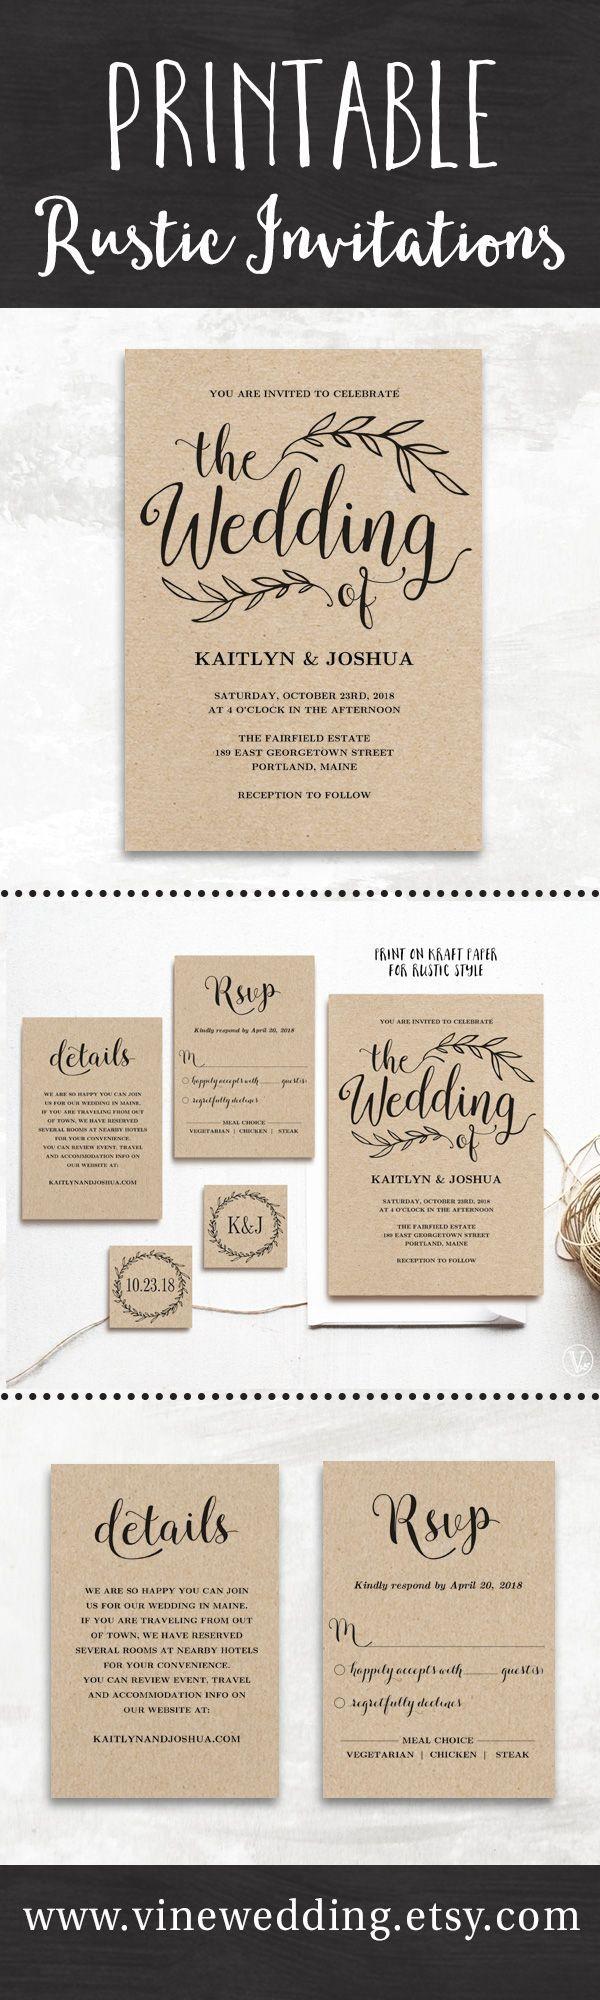 Beautiful rustic wedding invitations editable instant download